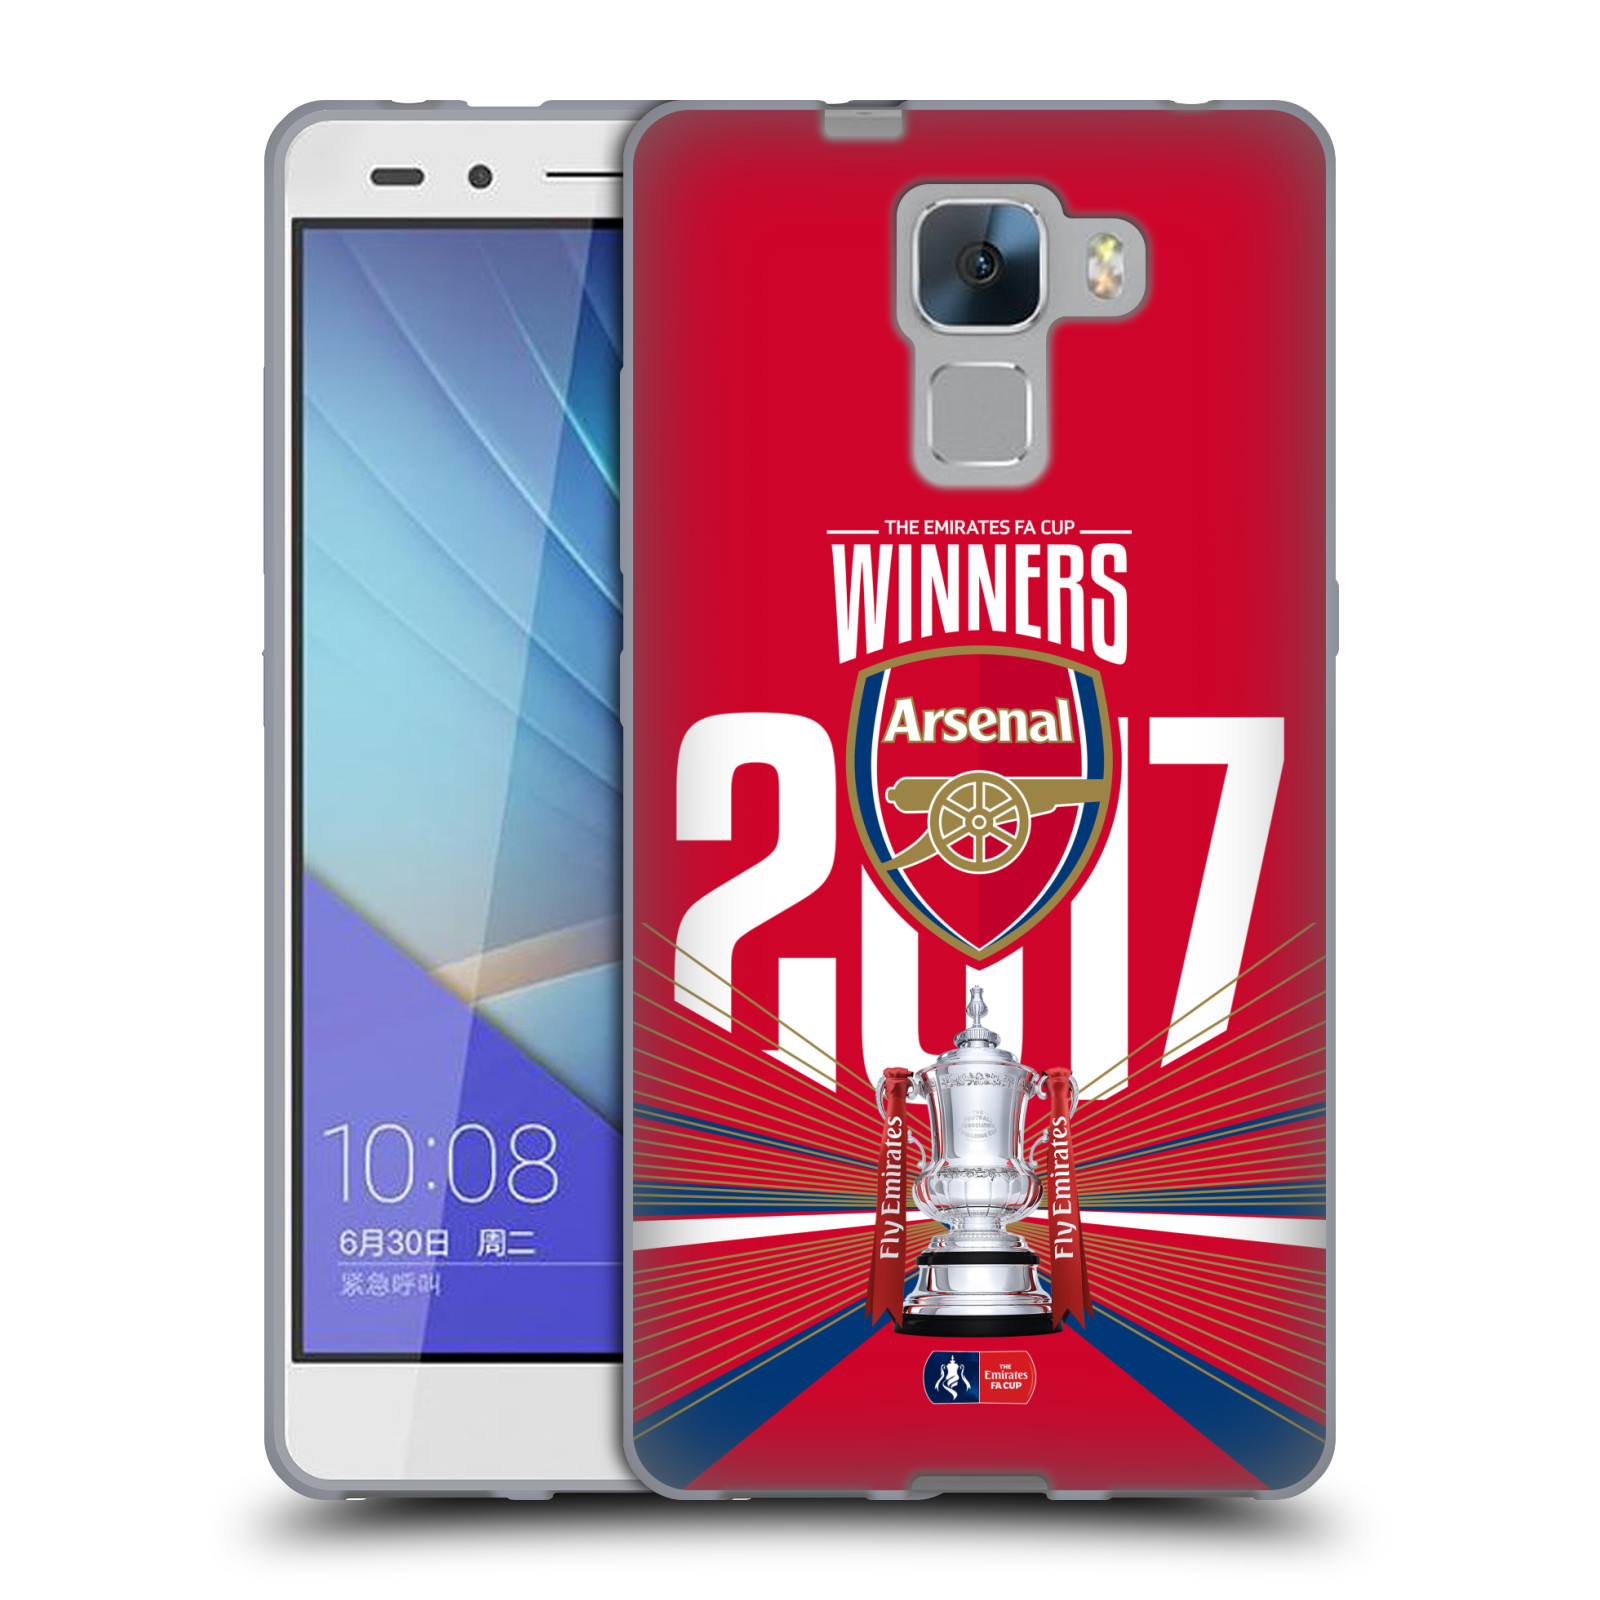 Silikonové pouzdro na mobil Honor 7 - Head Case - Arsenal FC - Trophy